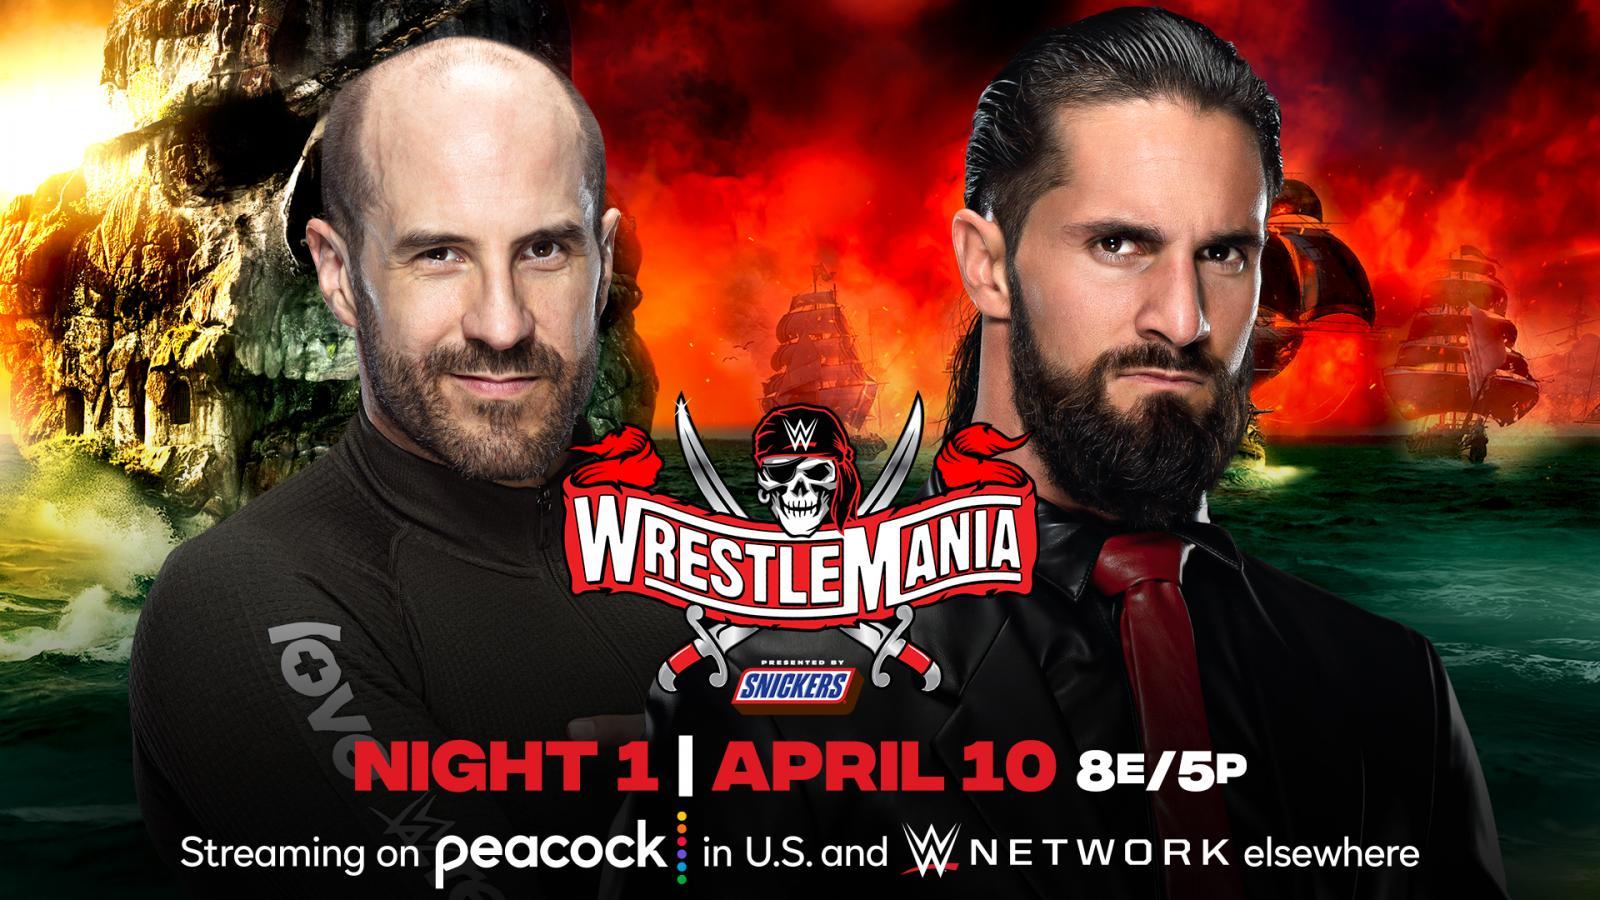 Wrestlemania 37, Cesaro, Seth Rollins